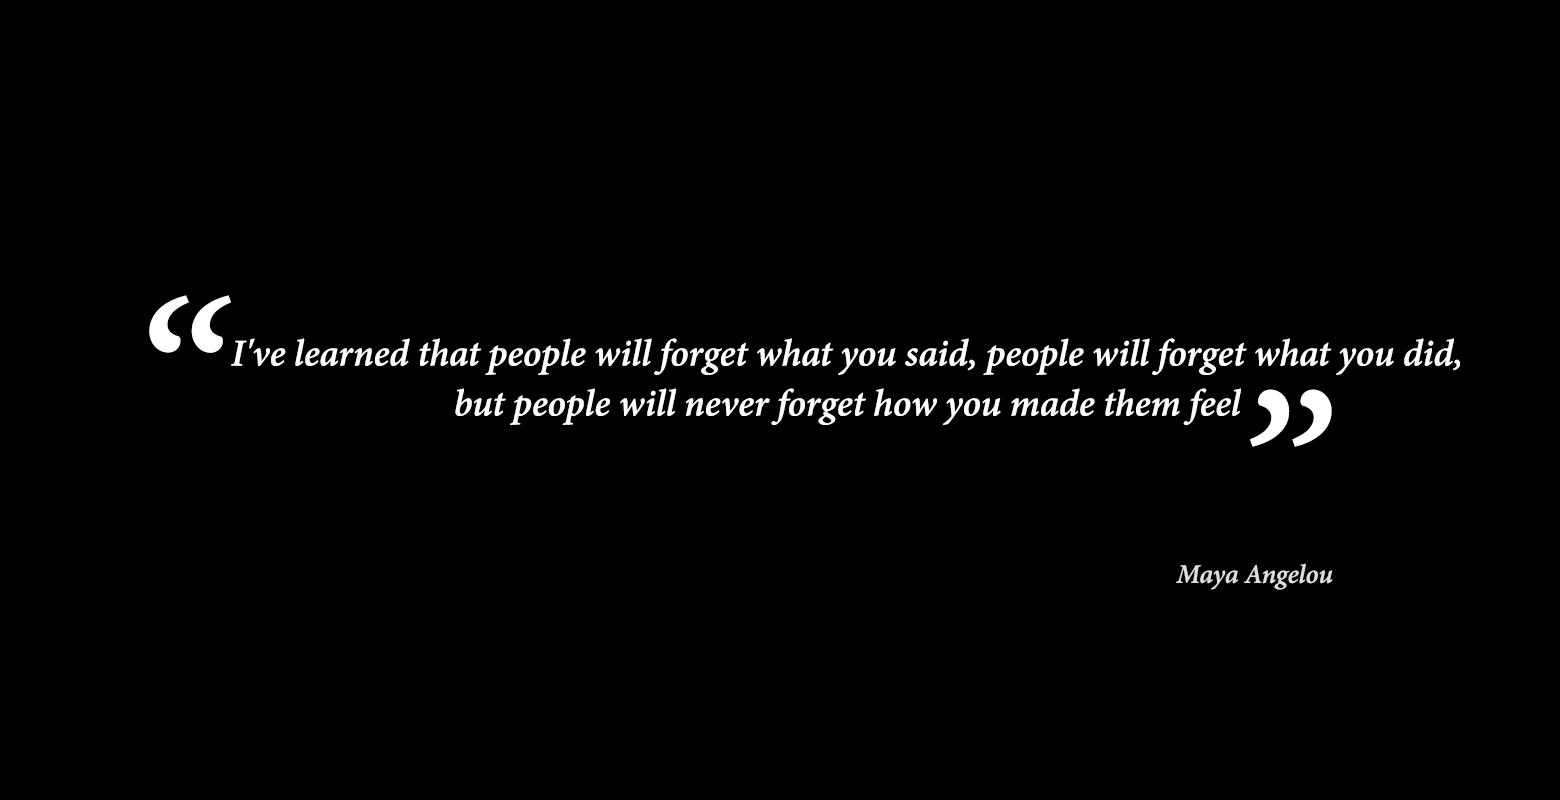 Maya Angleou Quotes